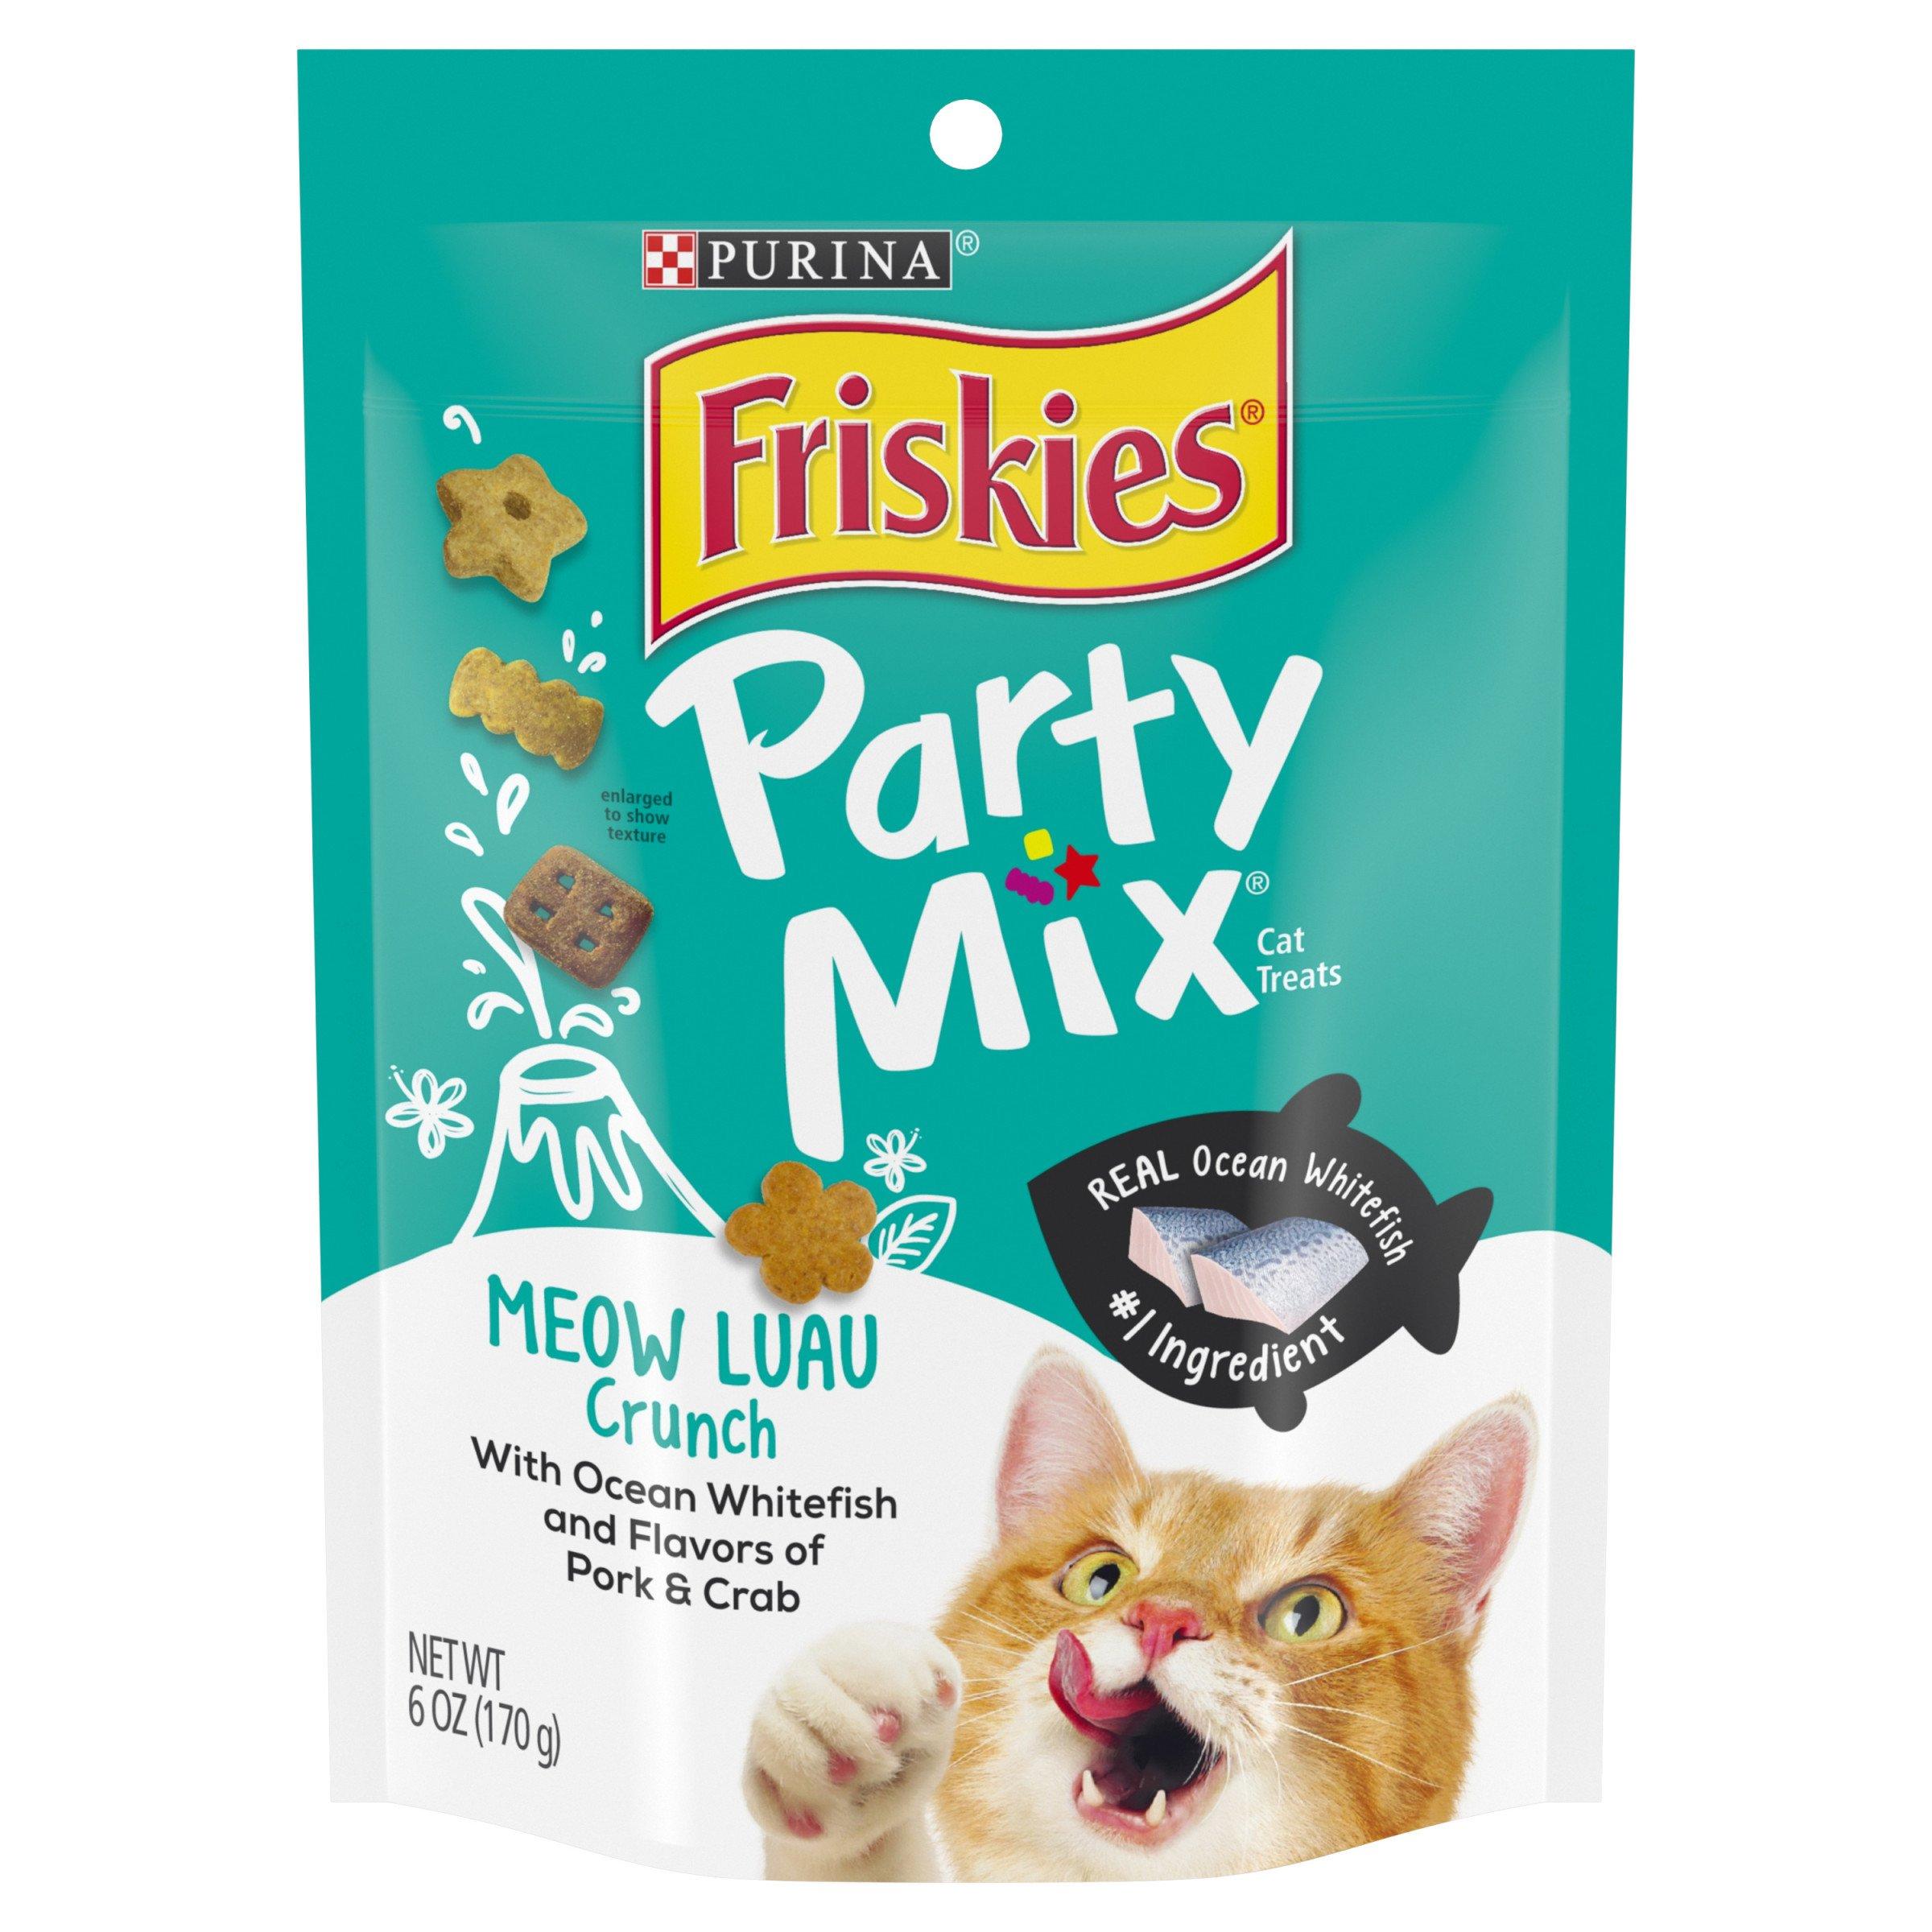 Purina Friskies Party Mix Meow Luau Crunch Adult Cat Treats -  (7) 6 Oz. Pouches by Purina Friskies (Image #1)